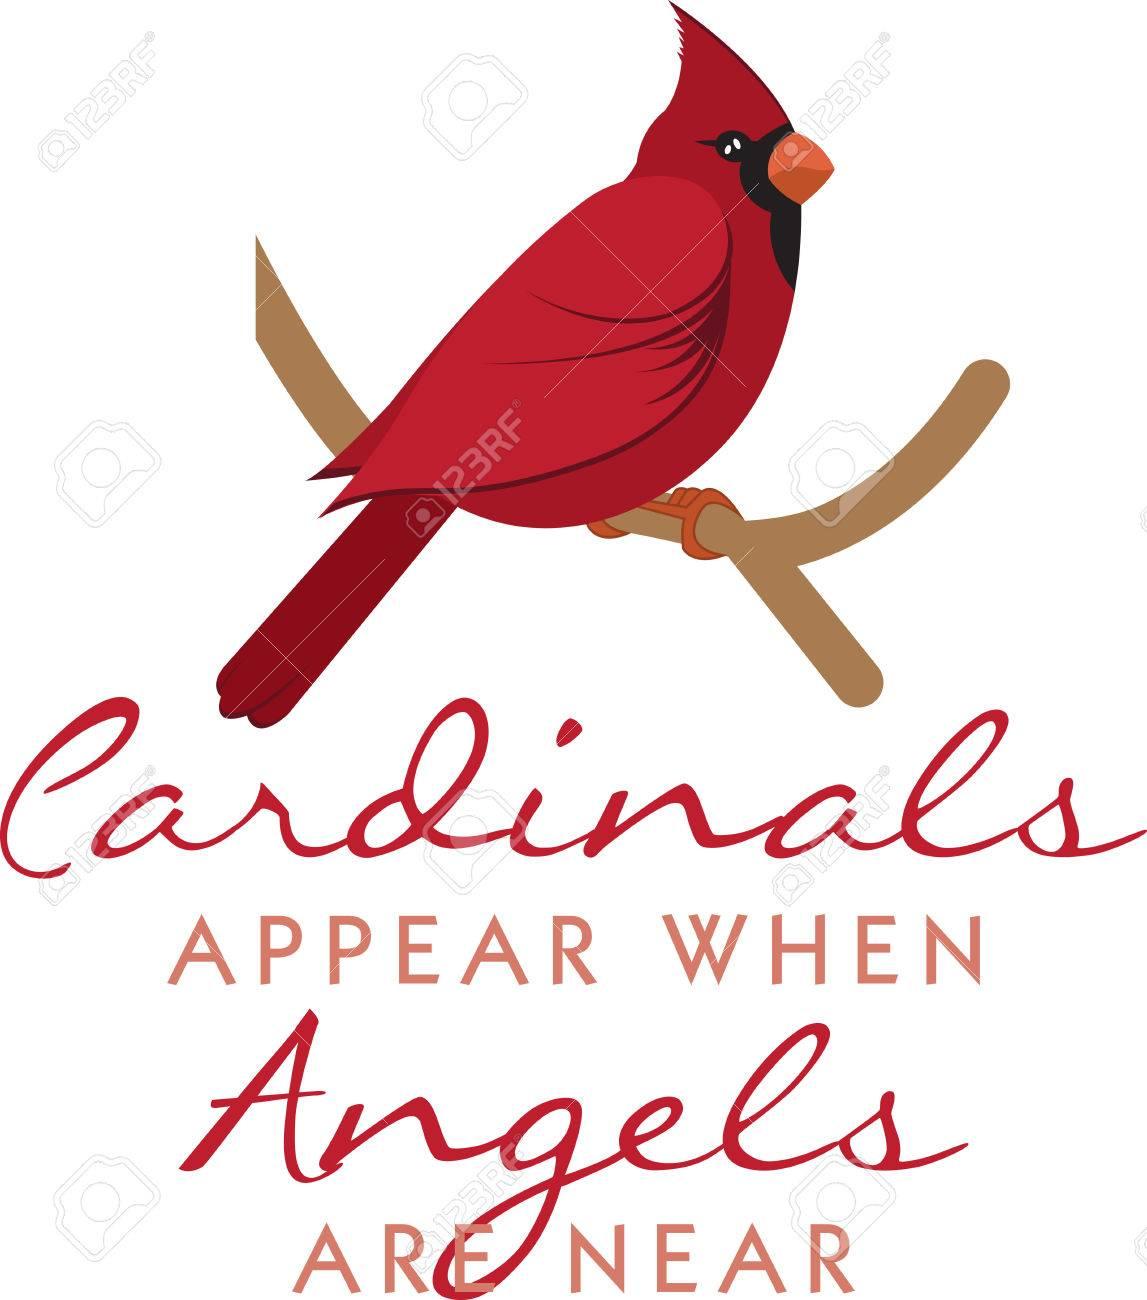 Free Clipart St Louis Cardinals Logo, Transparent PNG Clipart Images Free  Download - ClipartMax